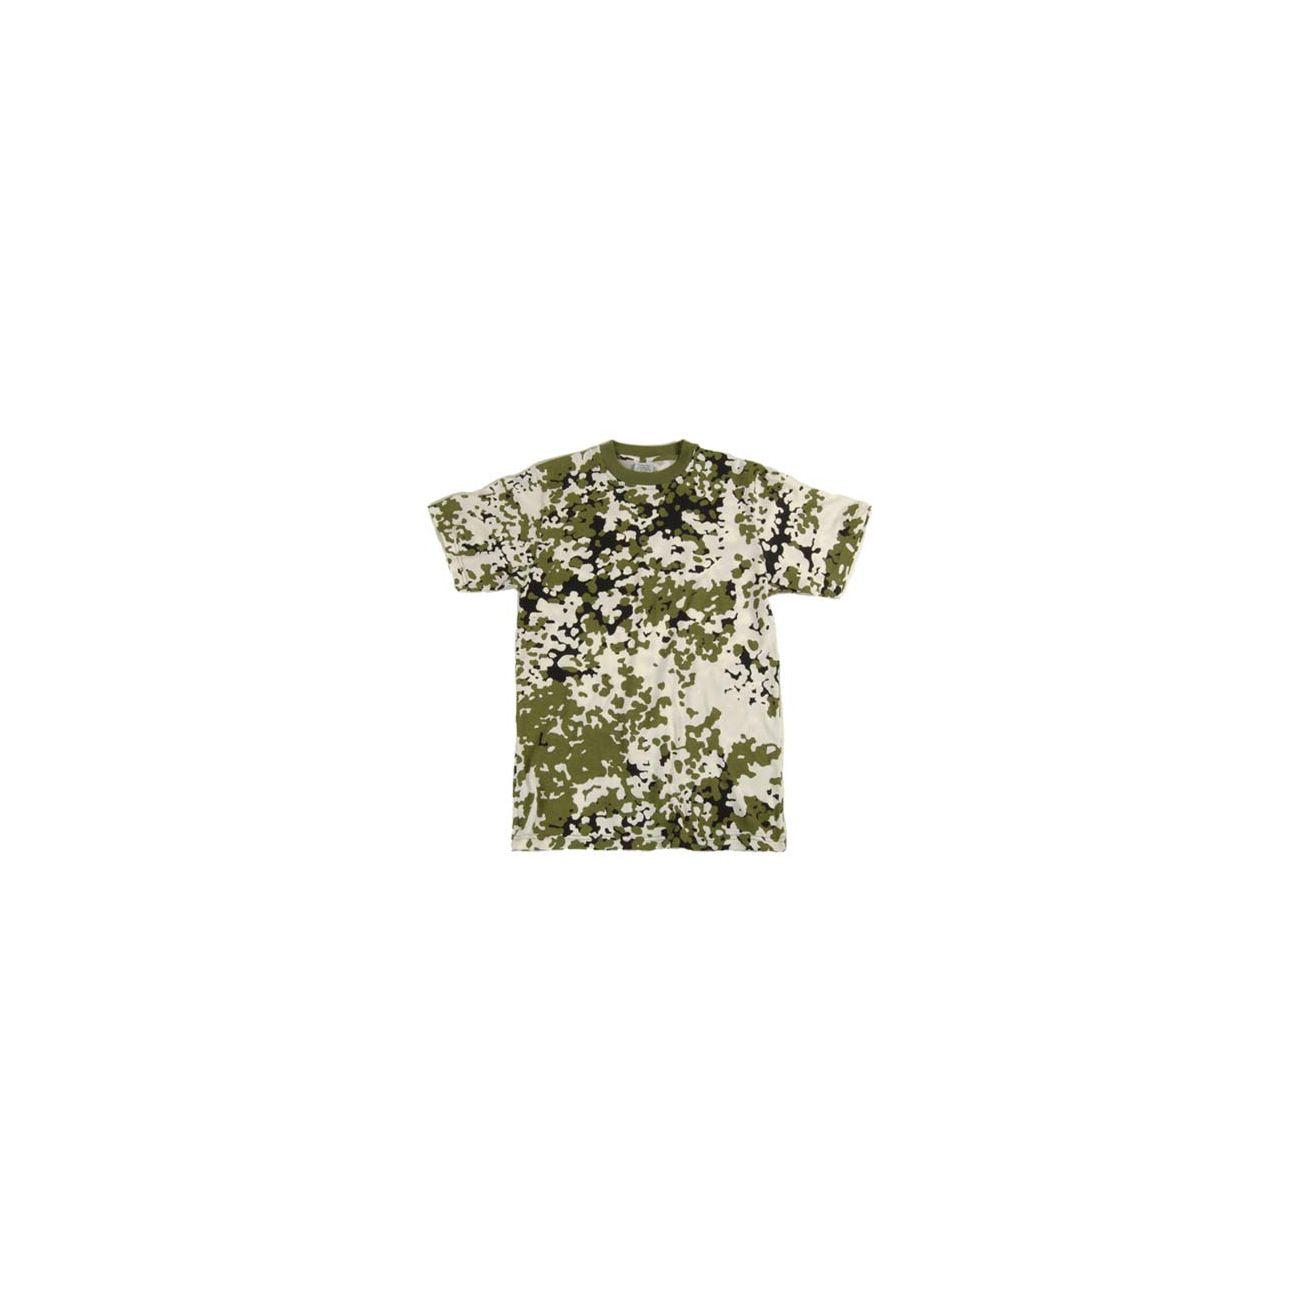 76edaaba004ad6 T-Shirt MMB, snow camo günstig kaufen - Kotte & Zeller